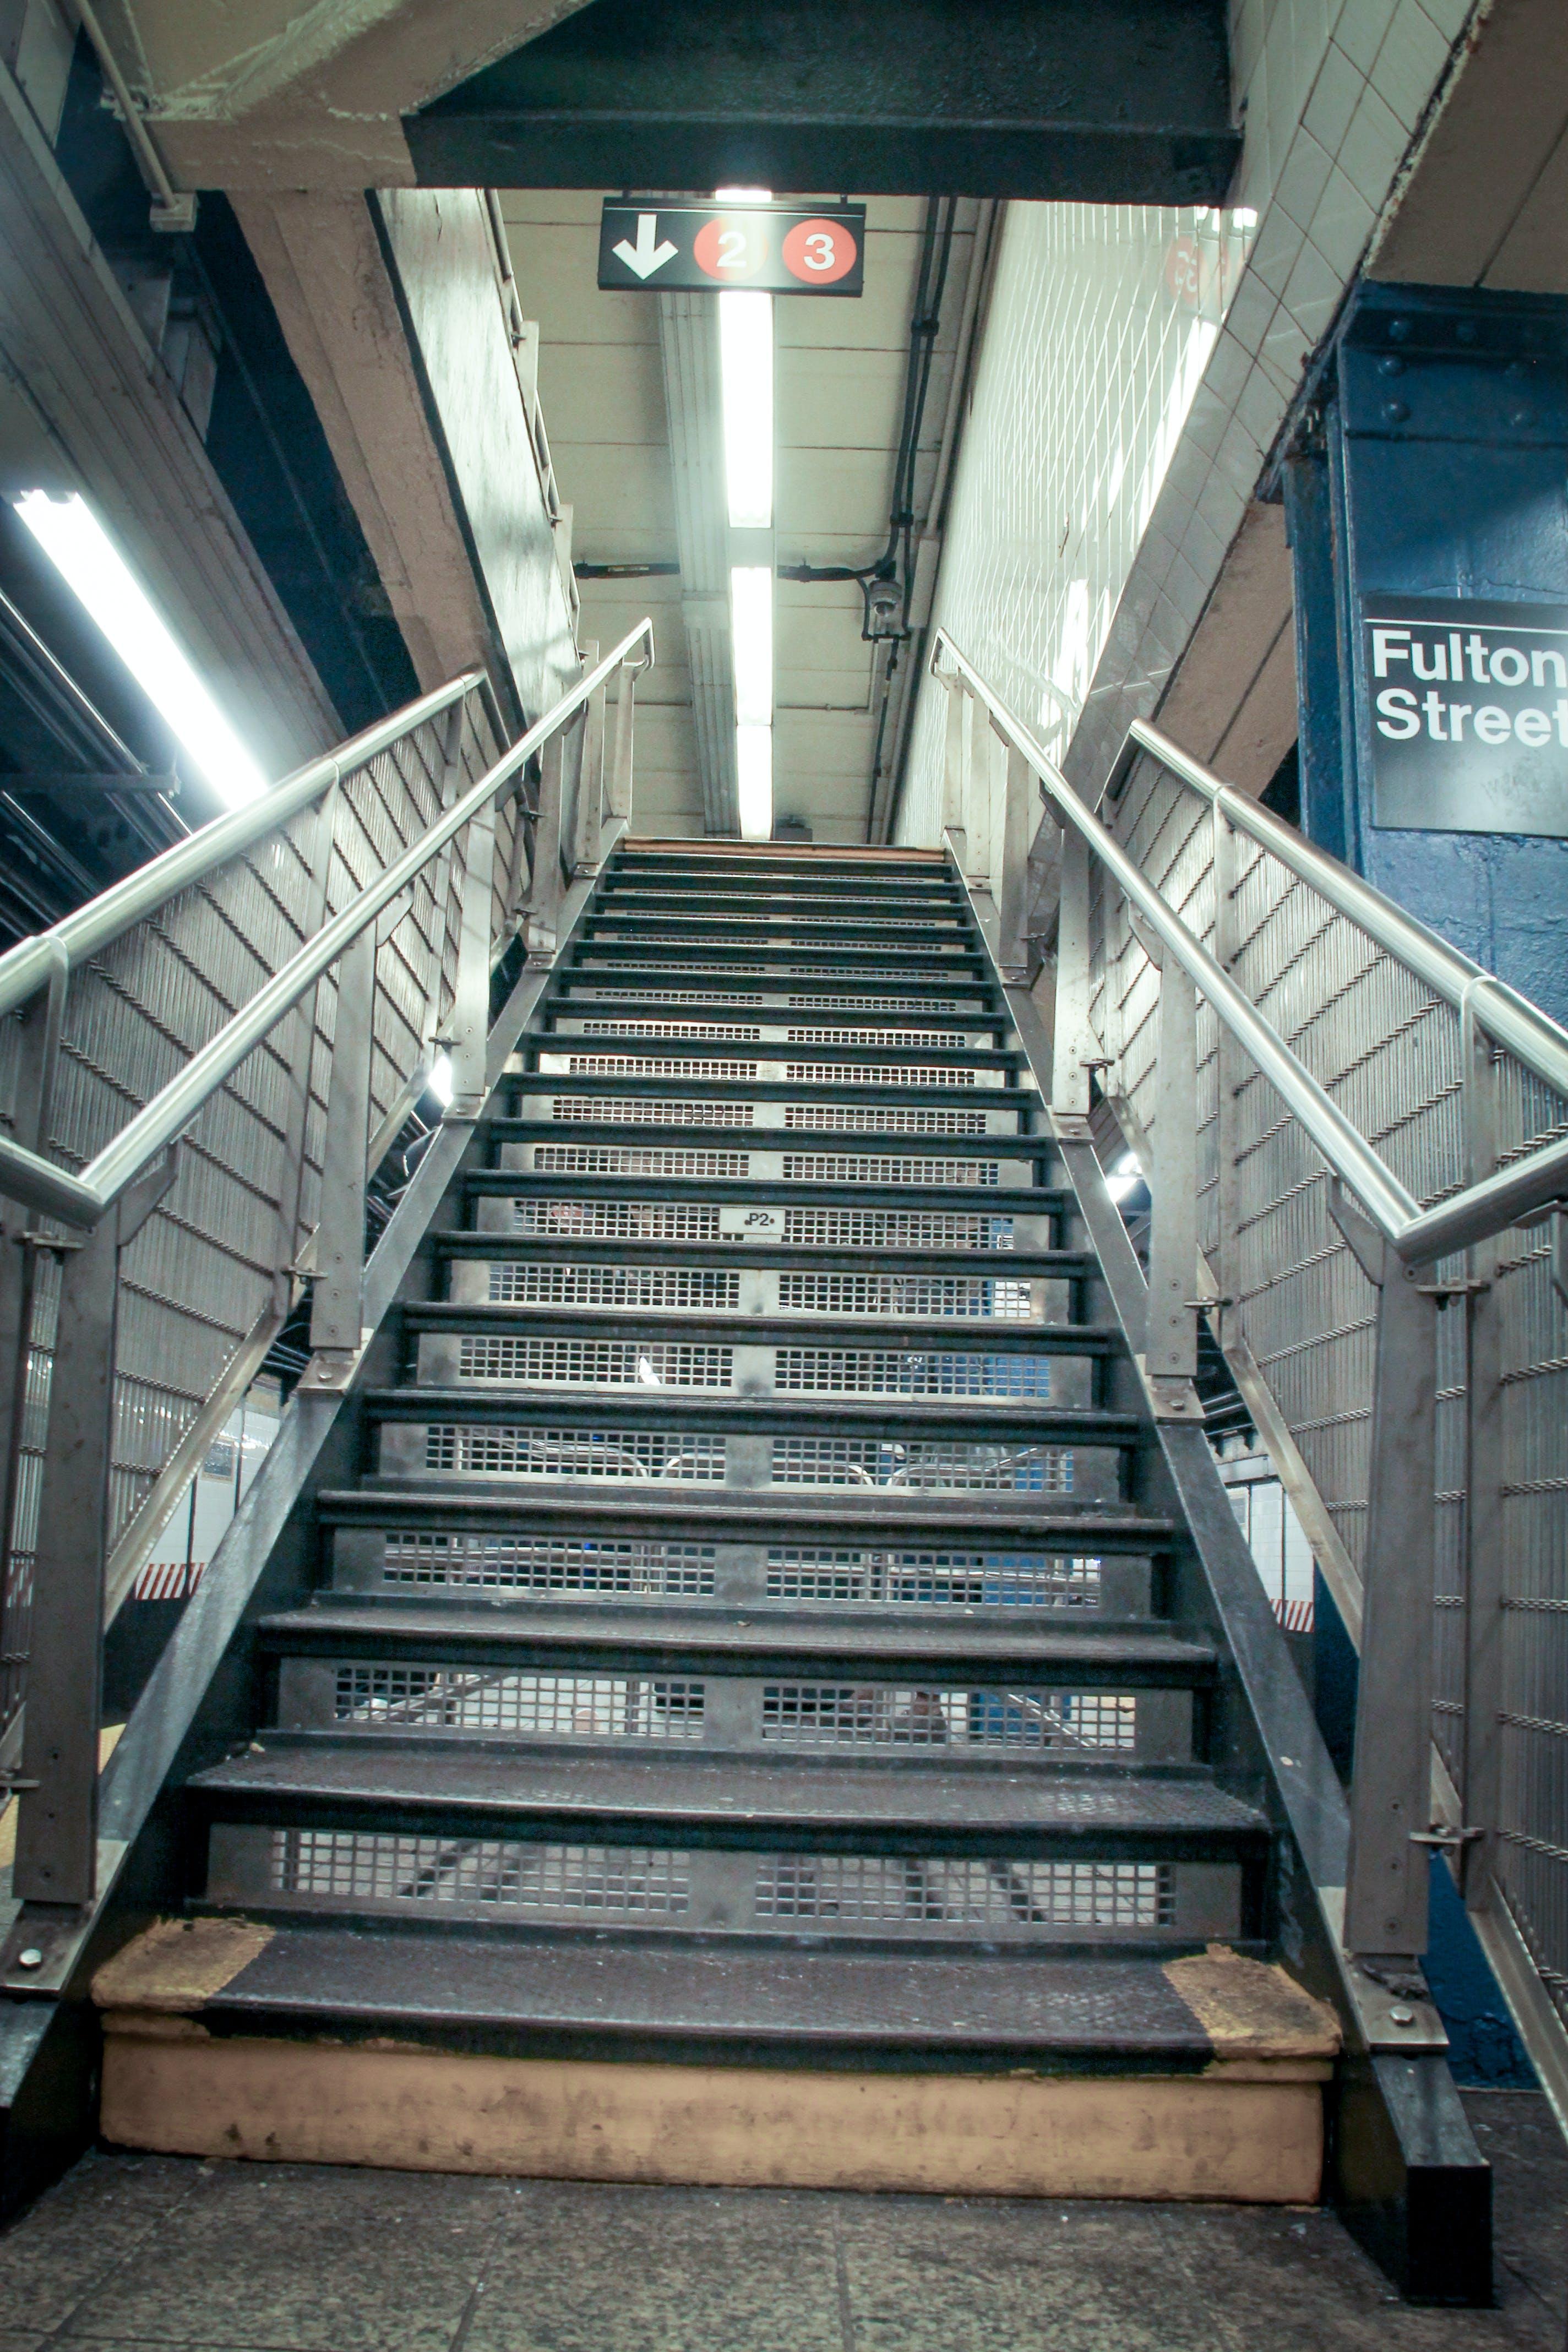 Fotos de stock gratuitas de escaleras, pasos, plata, subterraneo